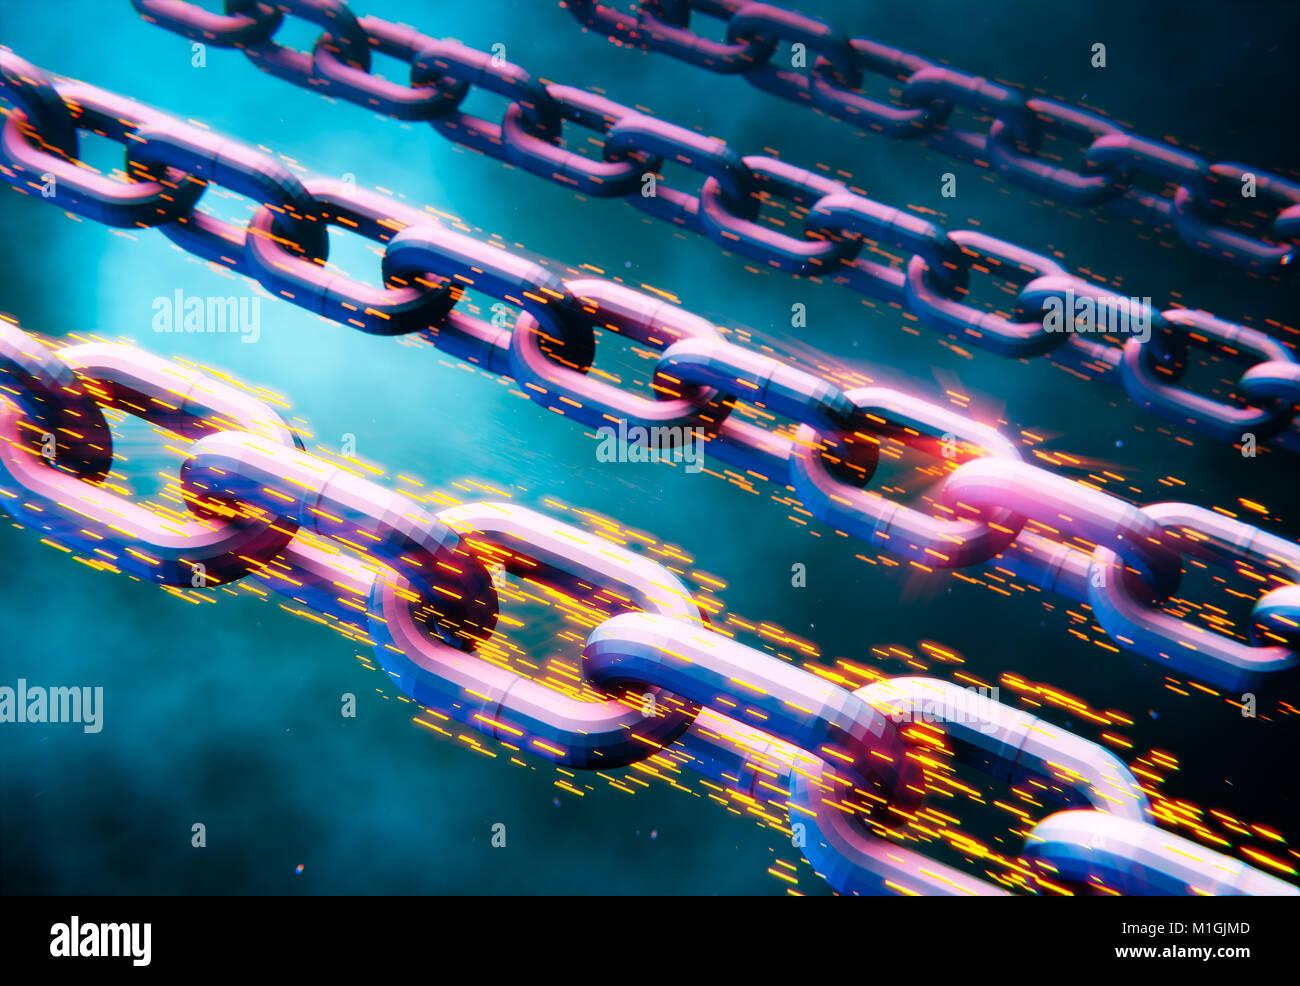 Blockchain data transfer bitcoin chains, abstract 3D illustration Stock Photo